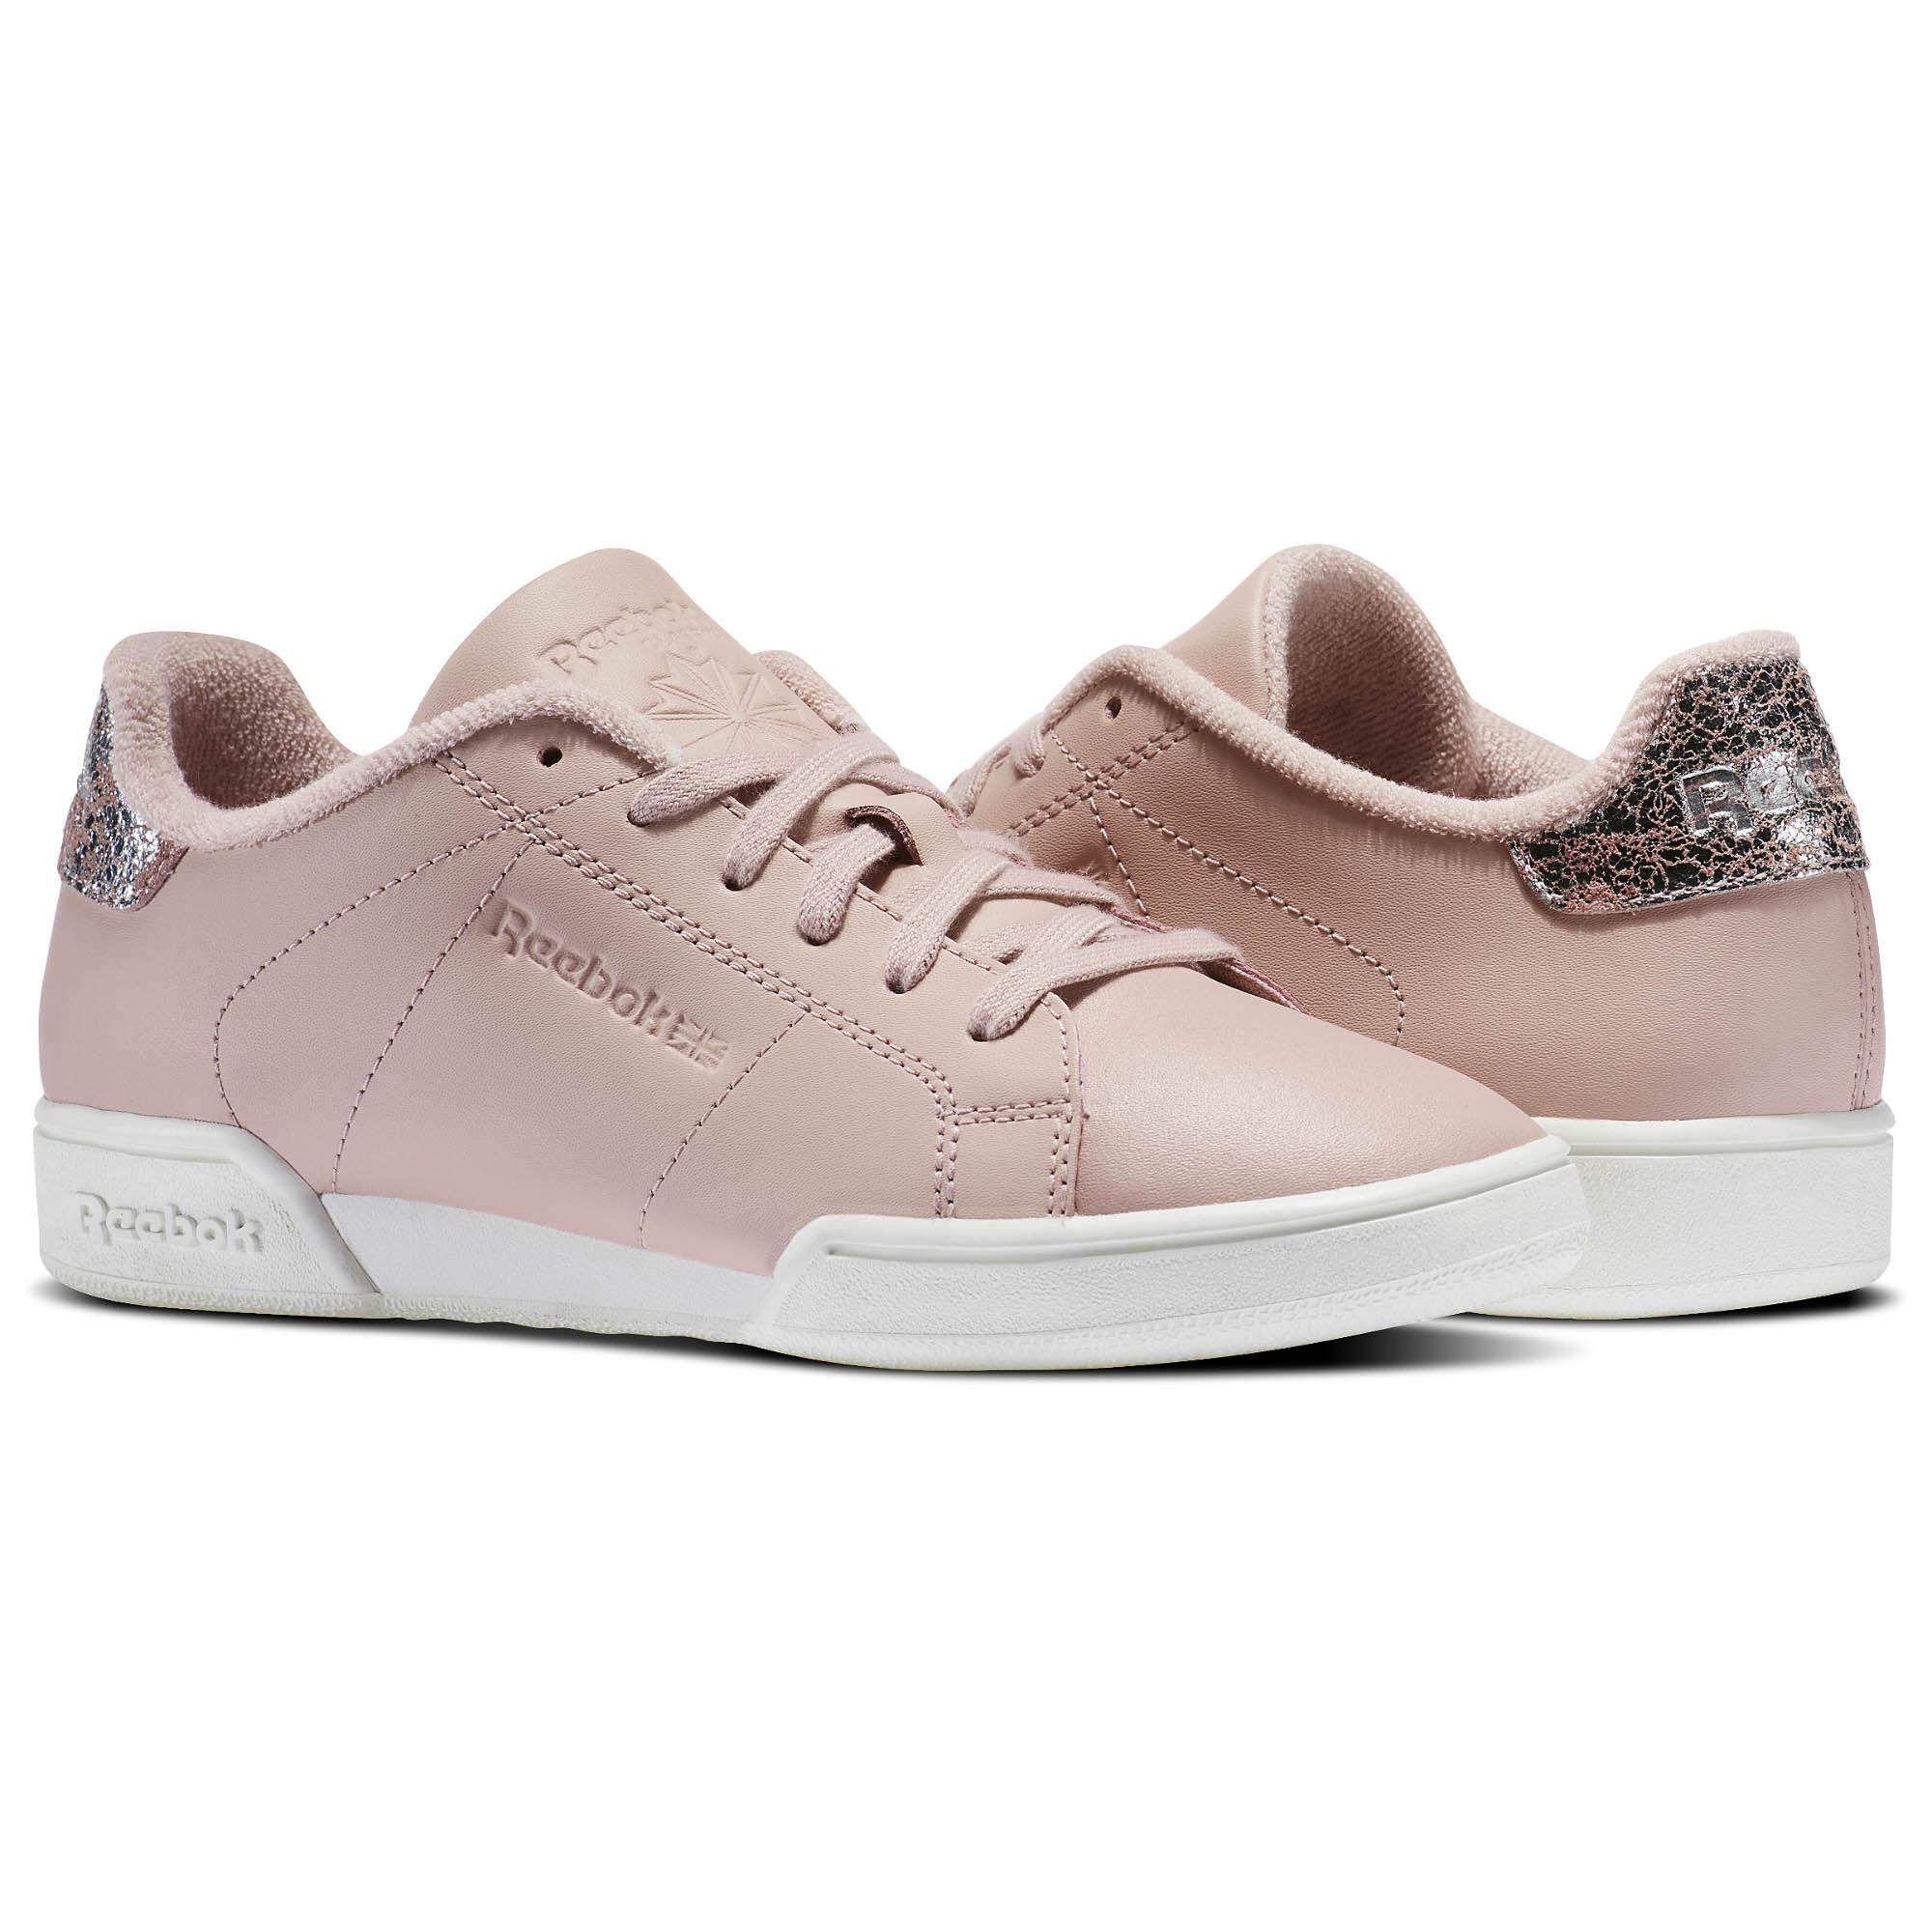 Reebok - Damen - Npc II Fbt - Sneaker - schwarz bk13bb9